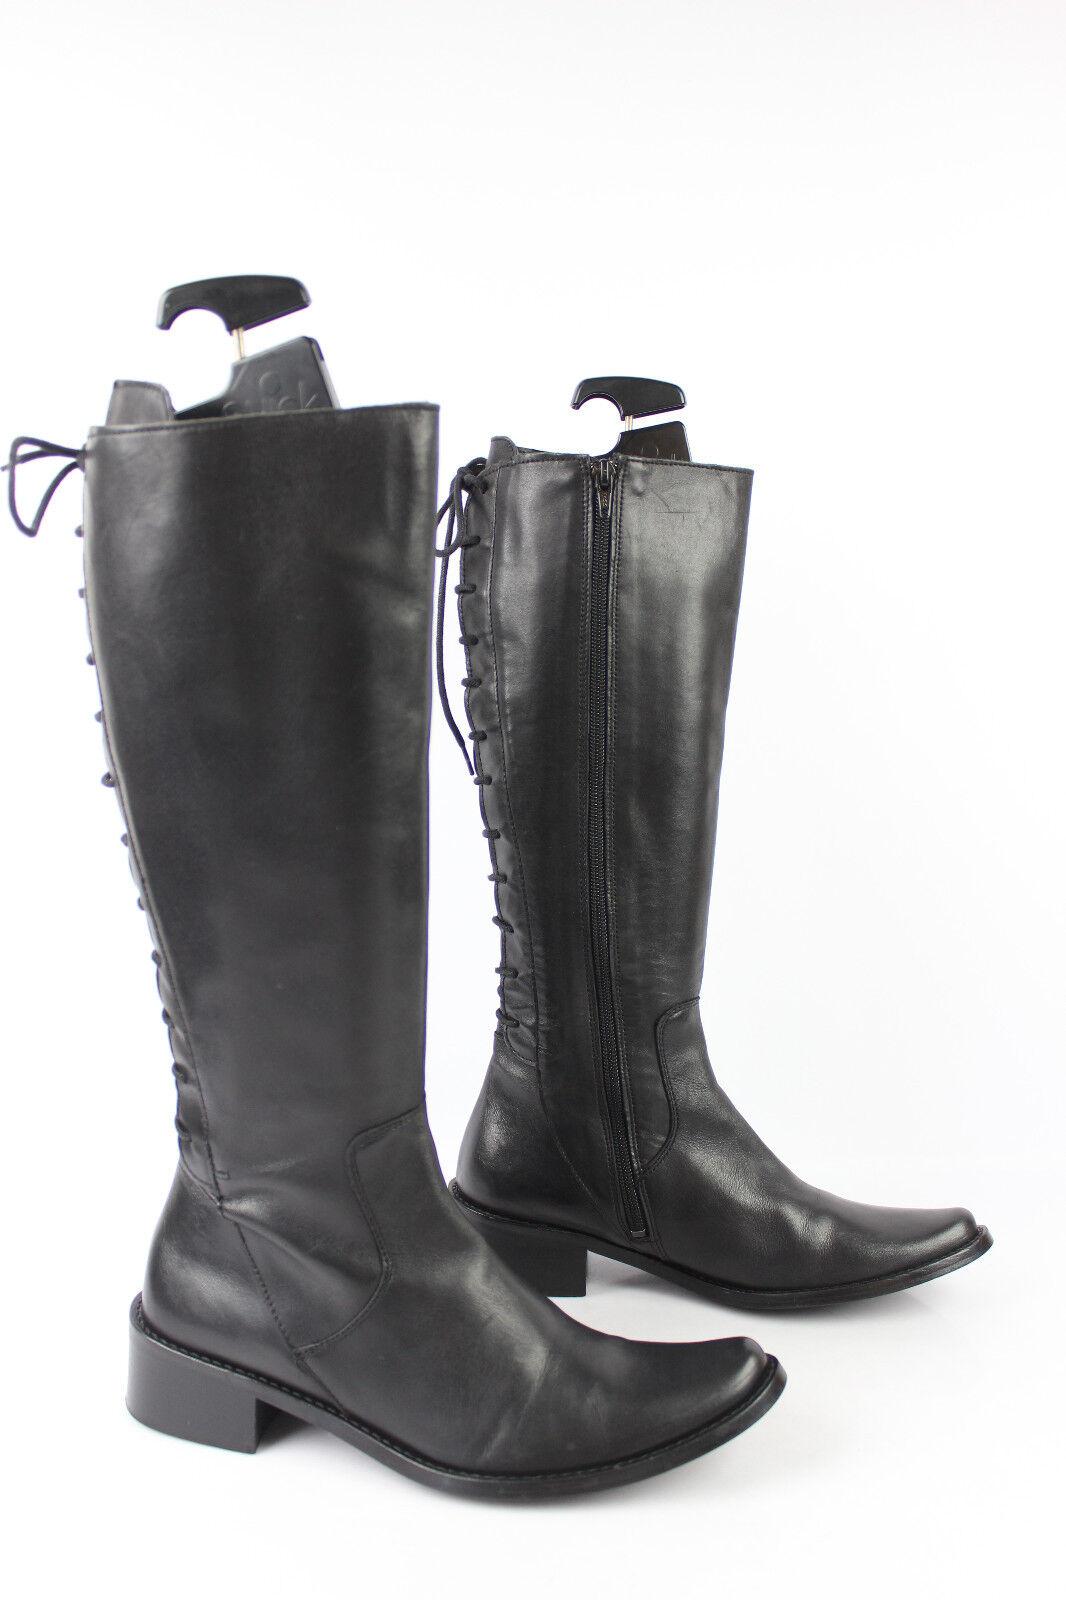 Stiefel Schnürsenkel schwarzes Leder guter Verdoppelt Leder T 38 sehr guter Leder Zustand 907b6c